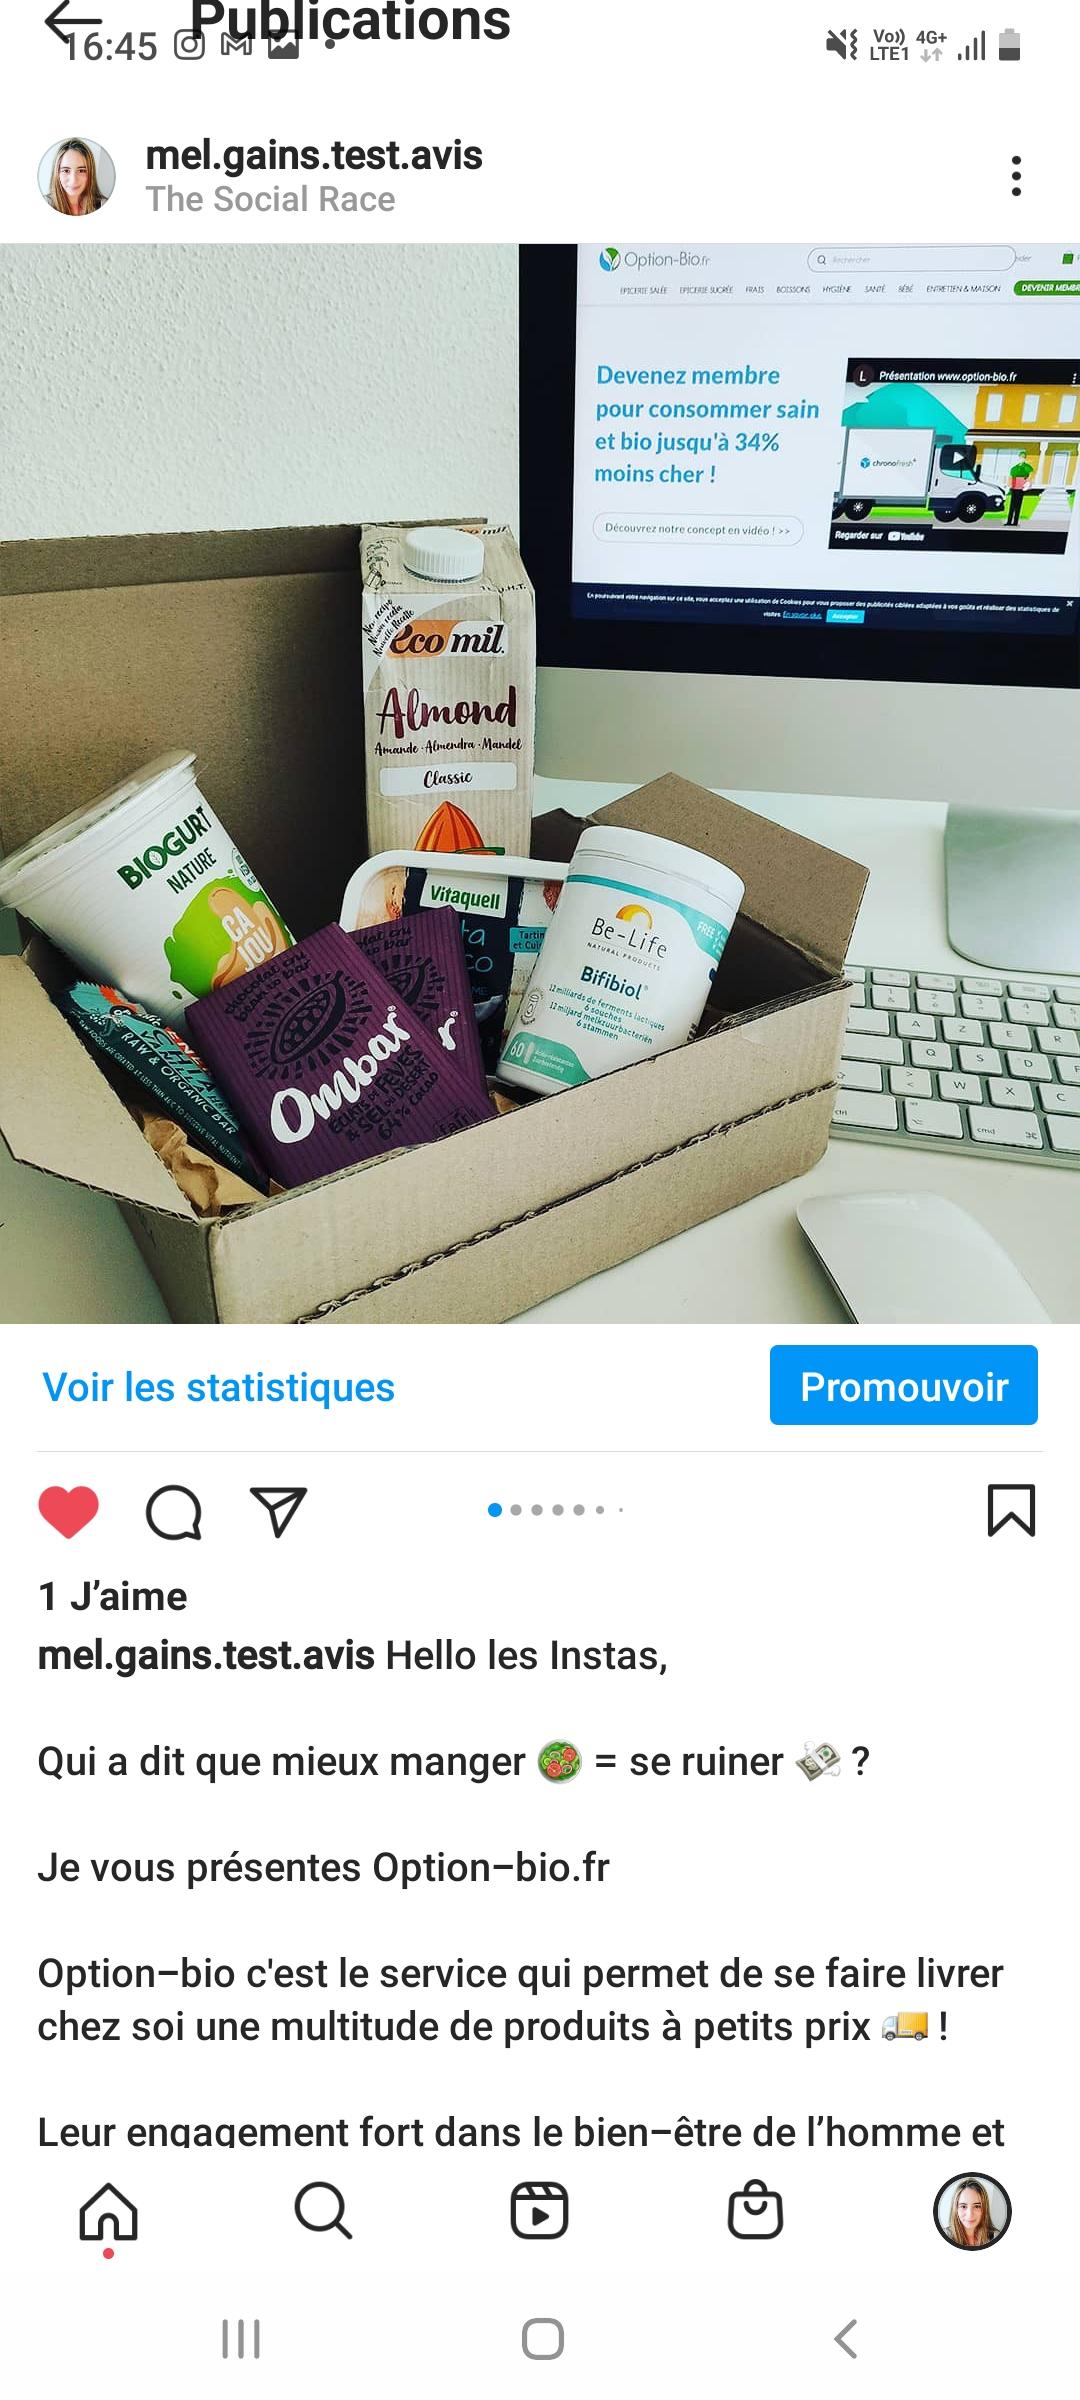 Promotion d'option-bio.fr